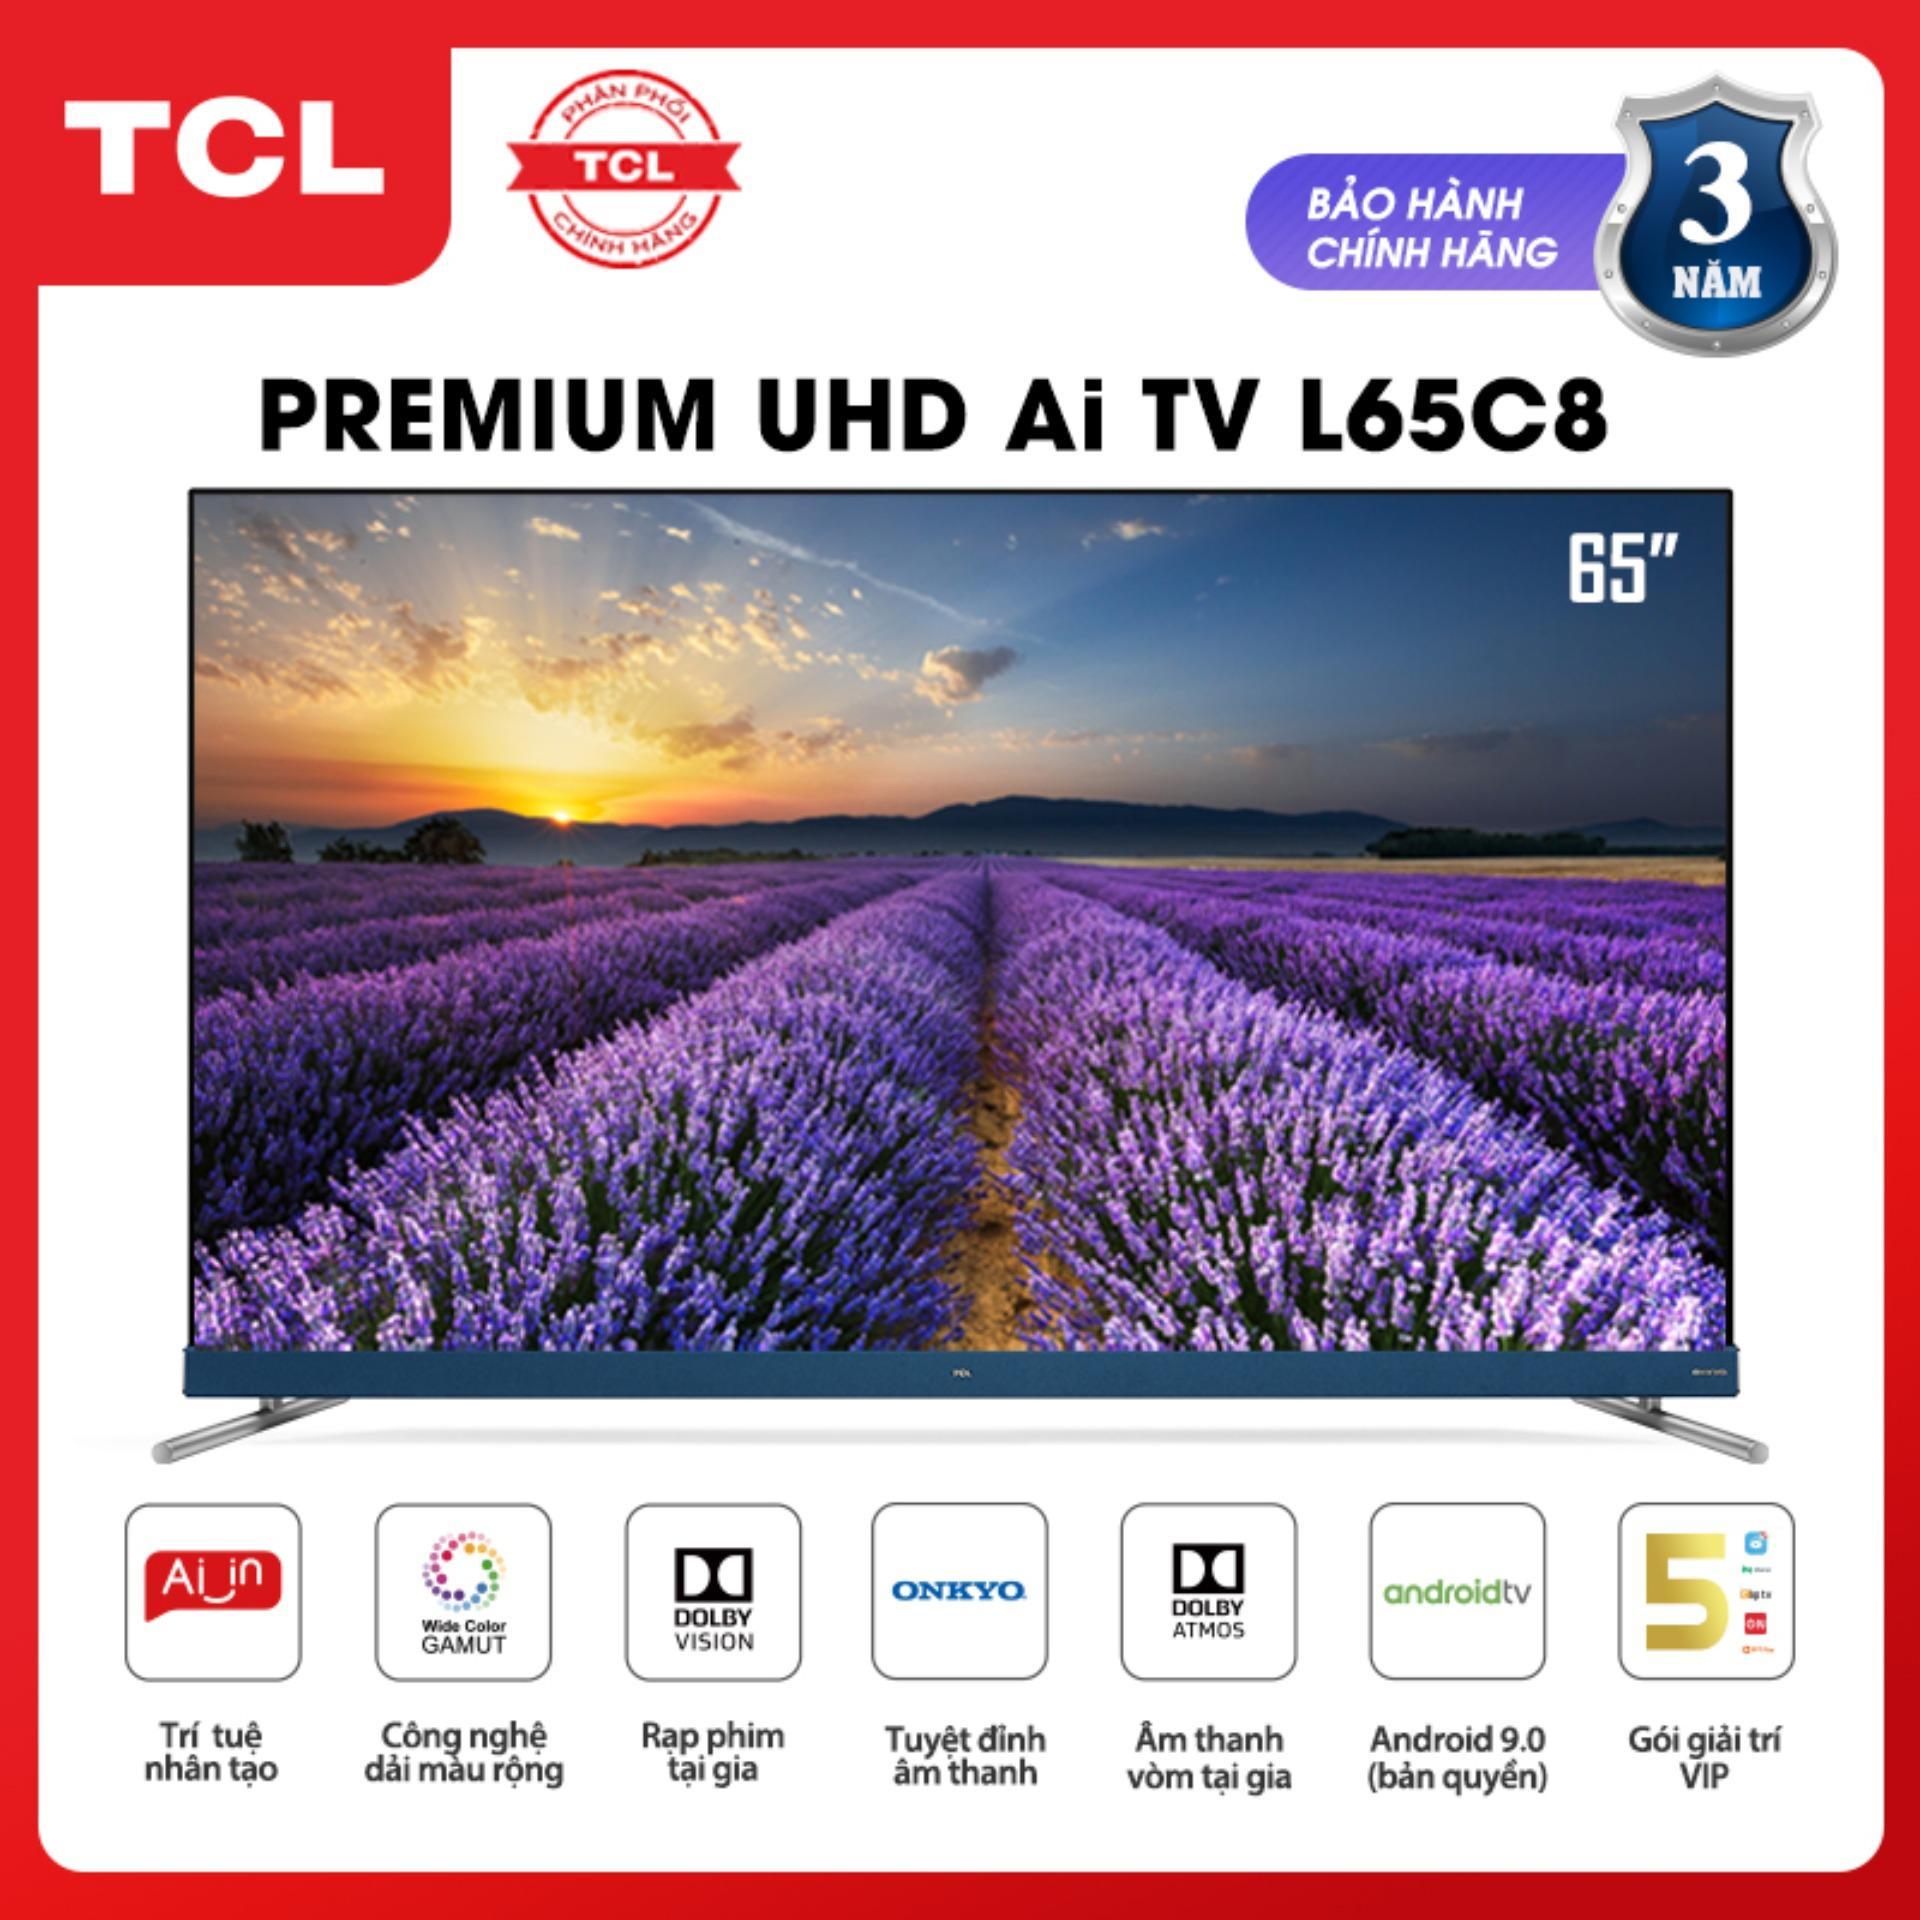 Bảng giá Android Tivi TCL 65 inch 4K UHD L65C8